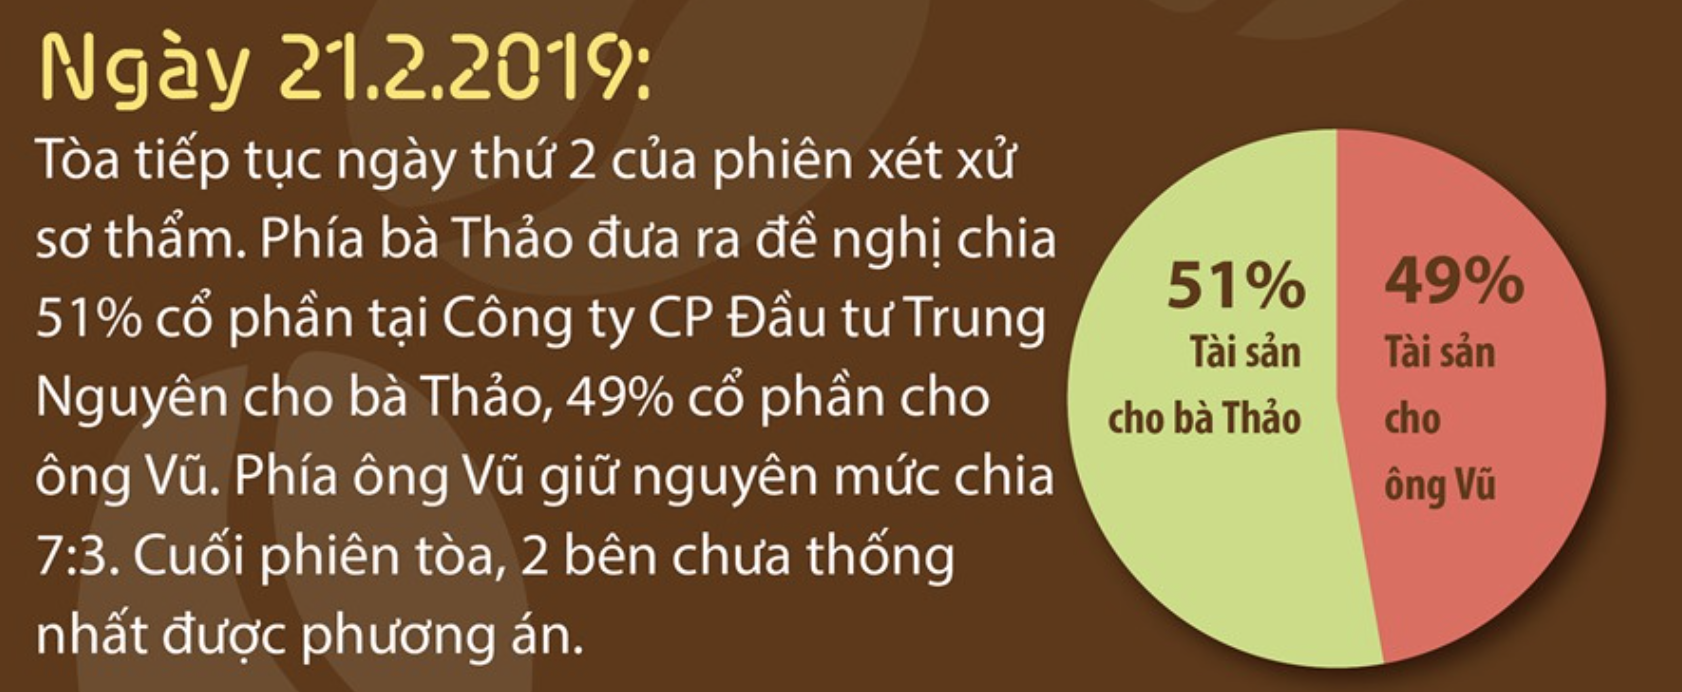 truoc phien phuc tham tai san trung nguyen duoc chia the nao